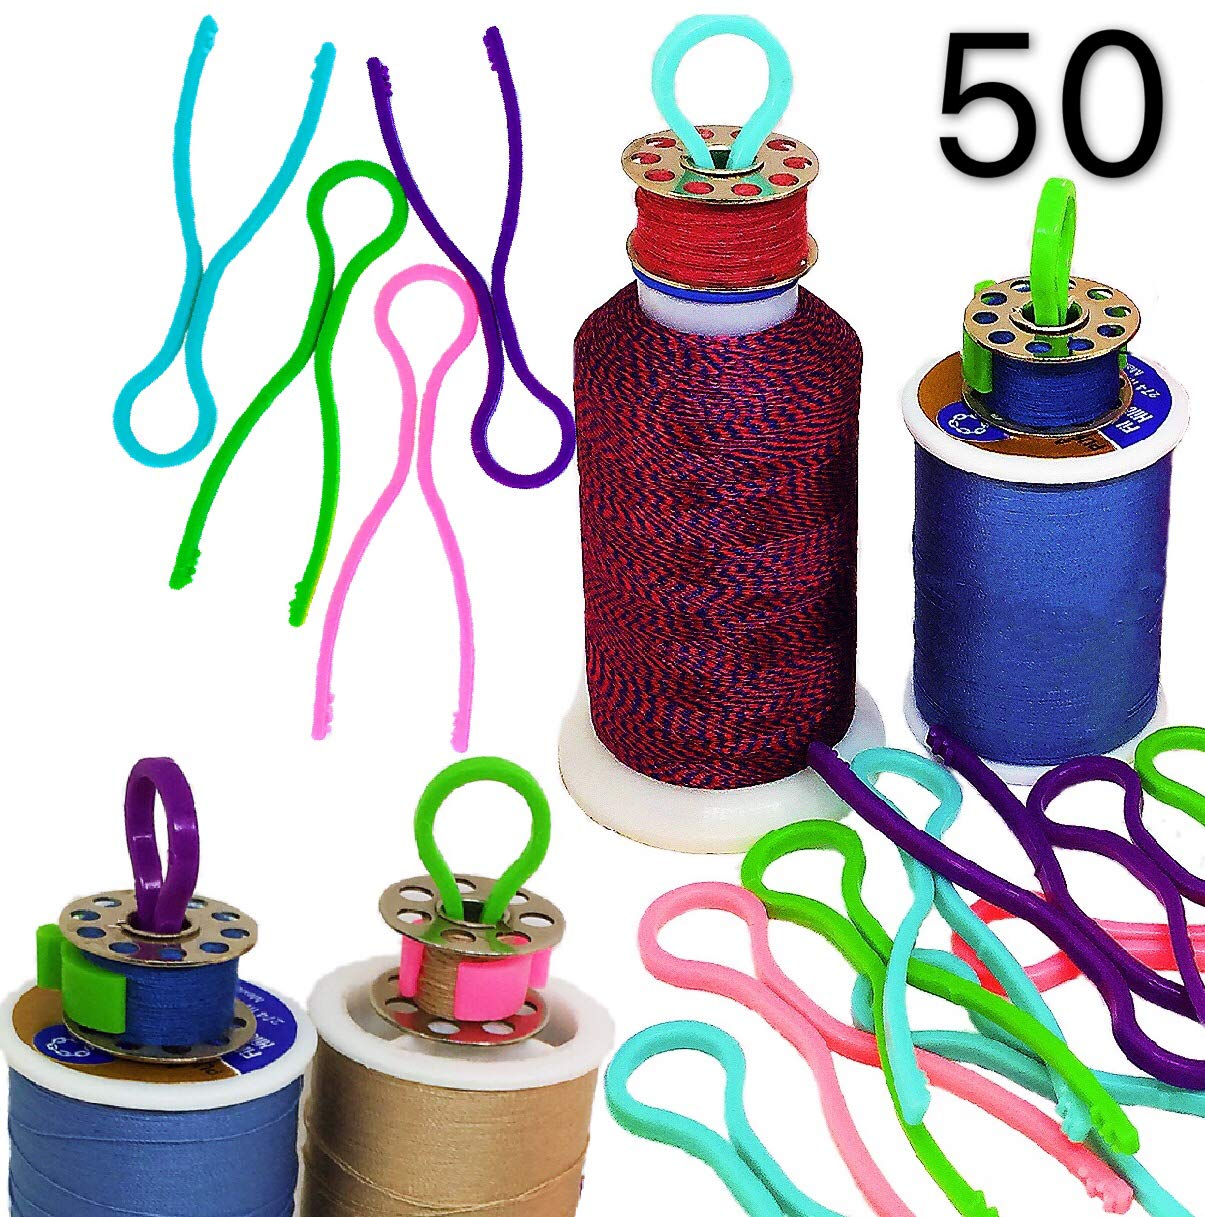 PeavyTailor Bobbin Buddies 50 pcs Thread Organizer Matching Thread Spools Together